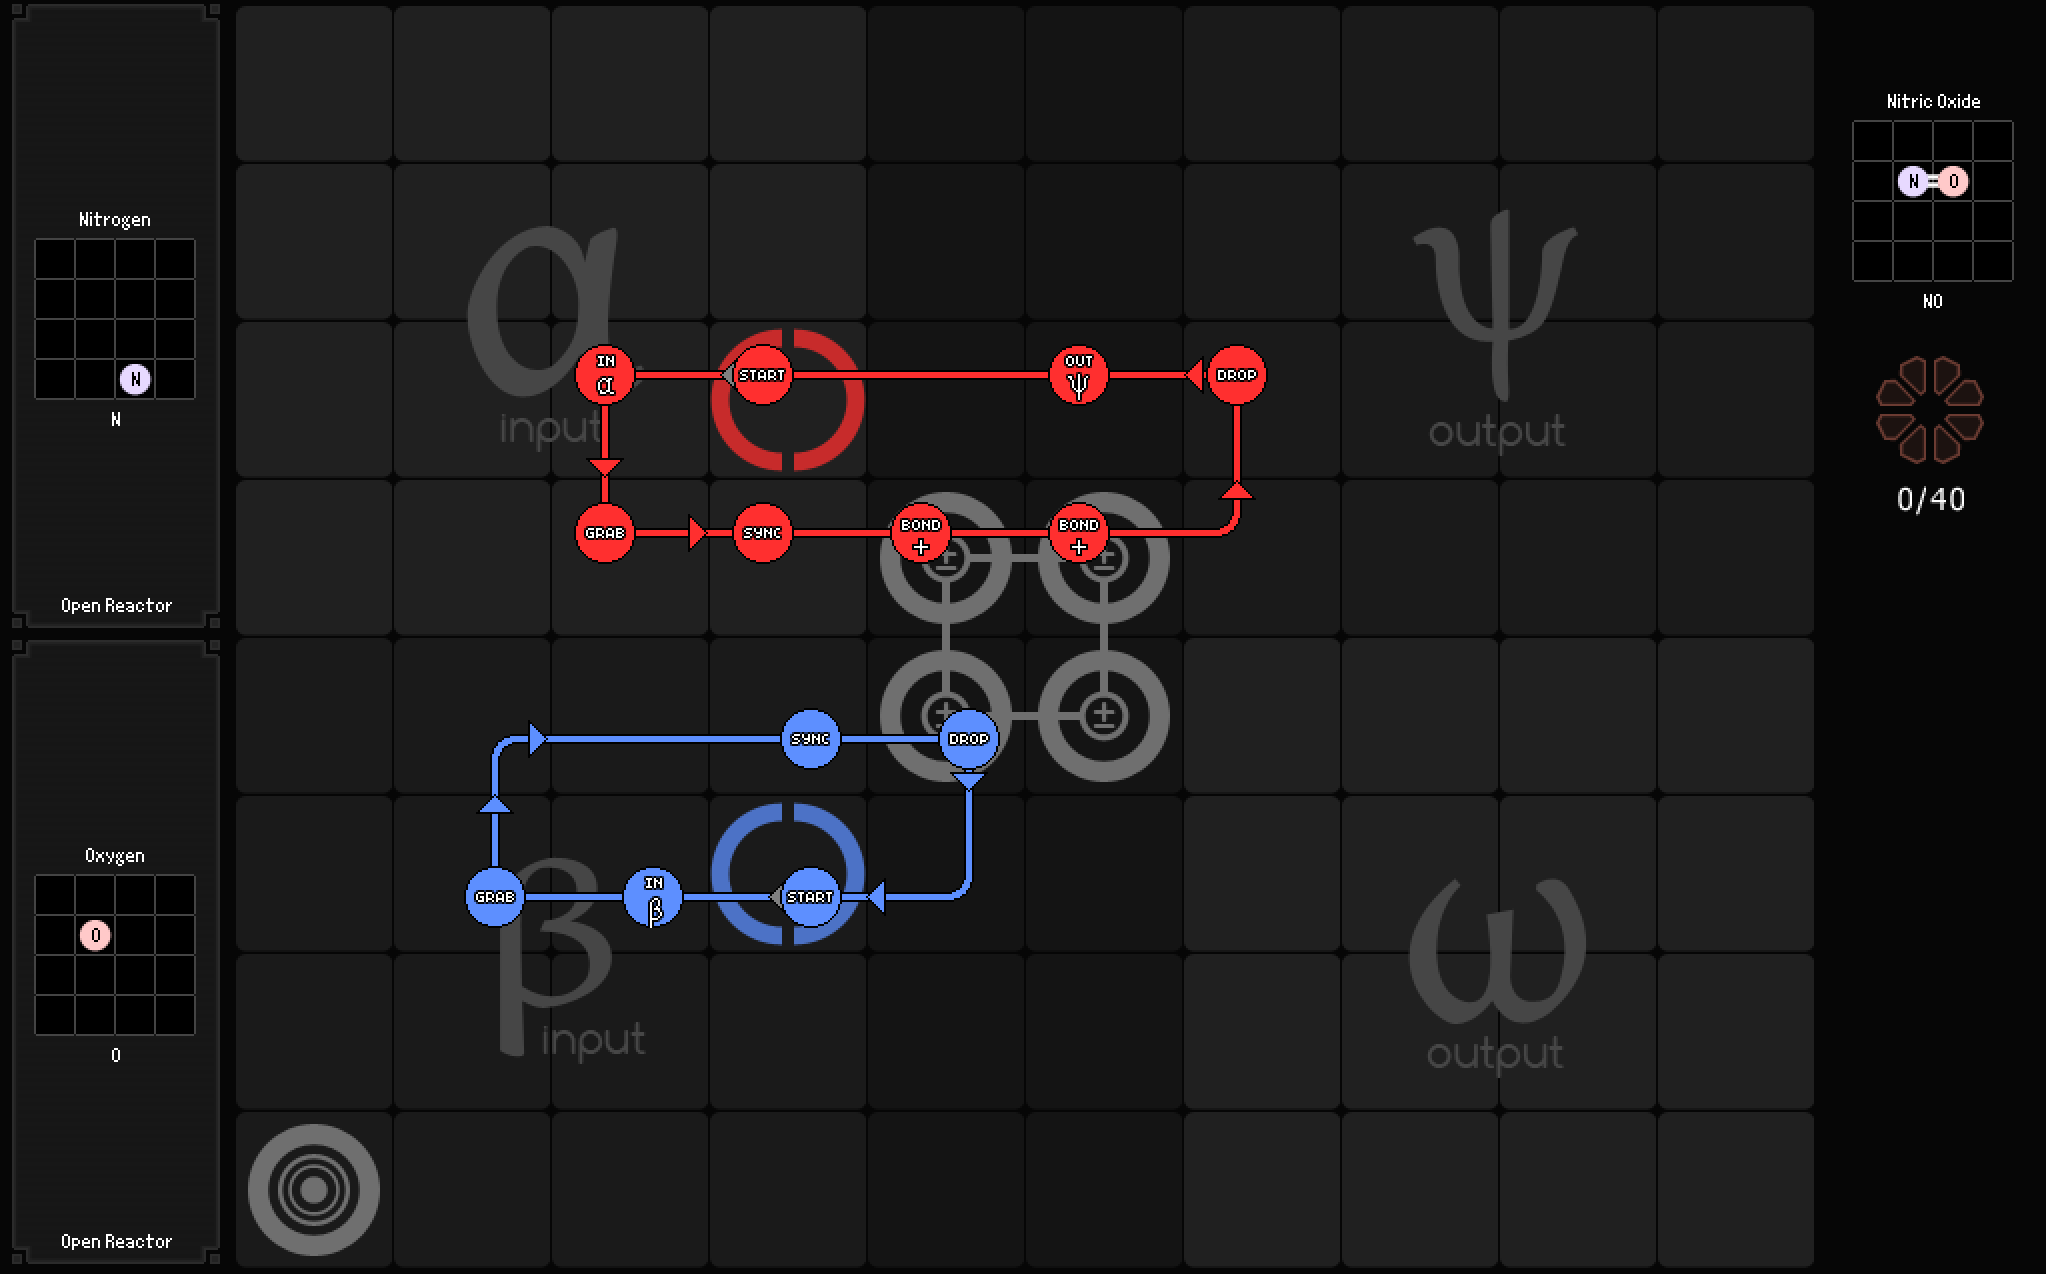 1_Story_Mode/4_Alkonost/SpaceChem-4.4.a/Reactor_2.png